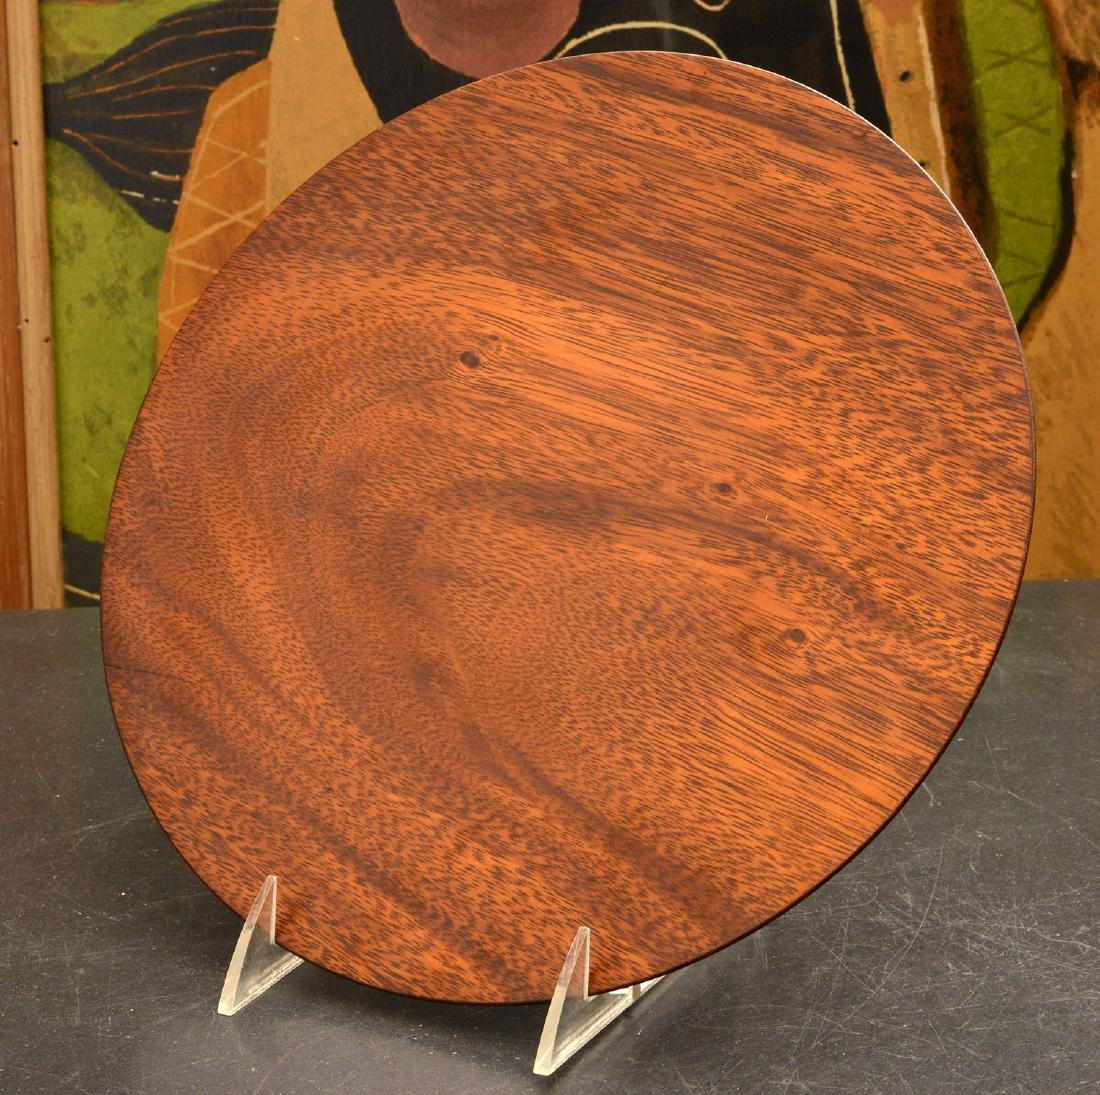 Bob Stocksdale, turned wood plate